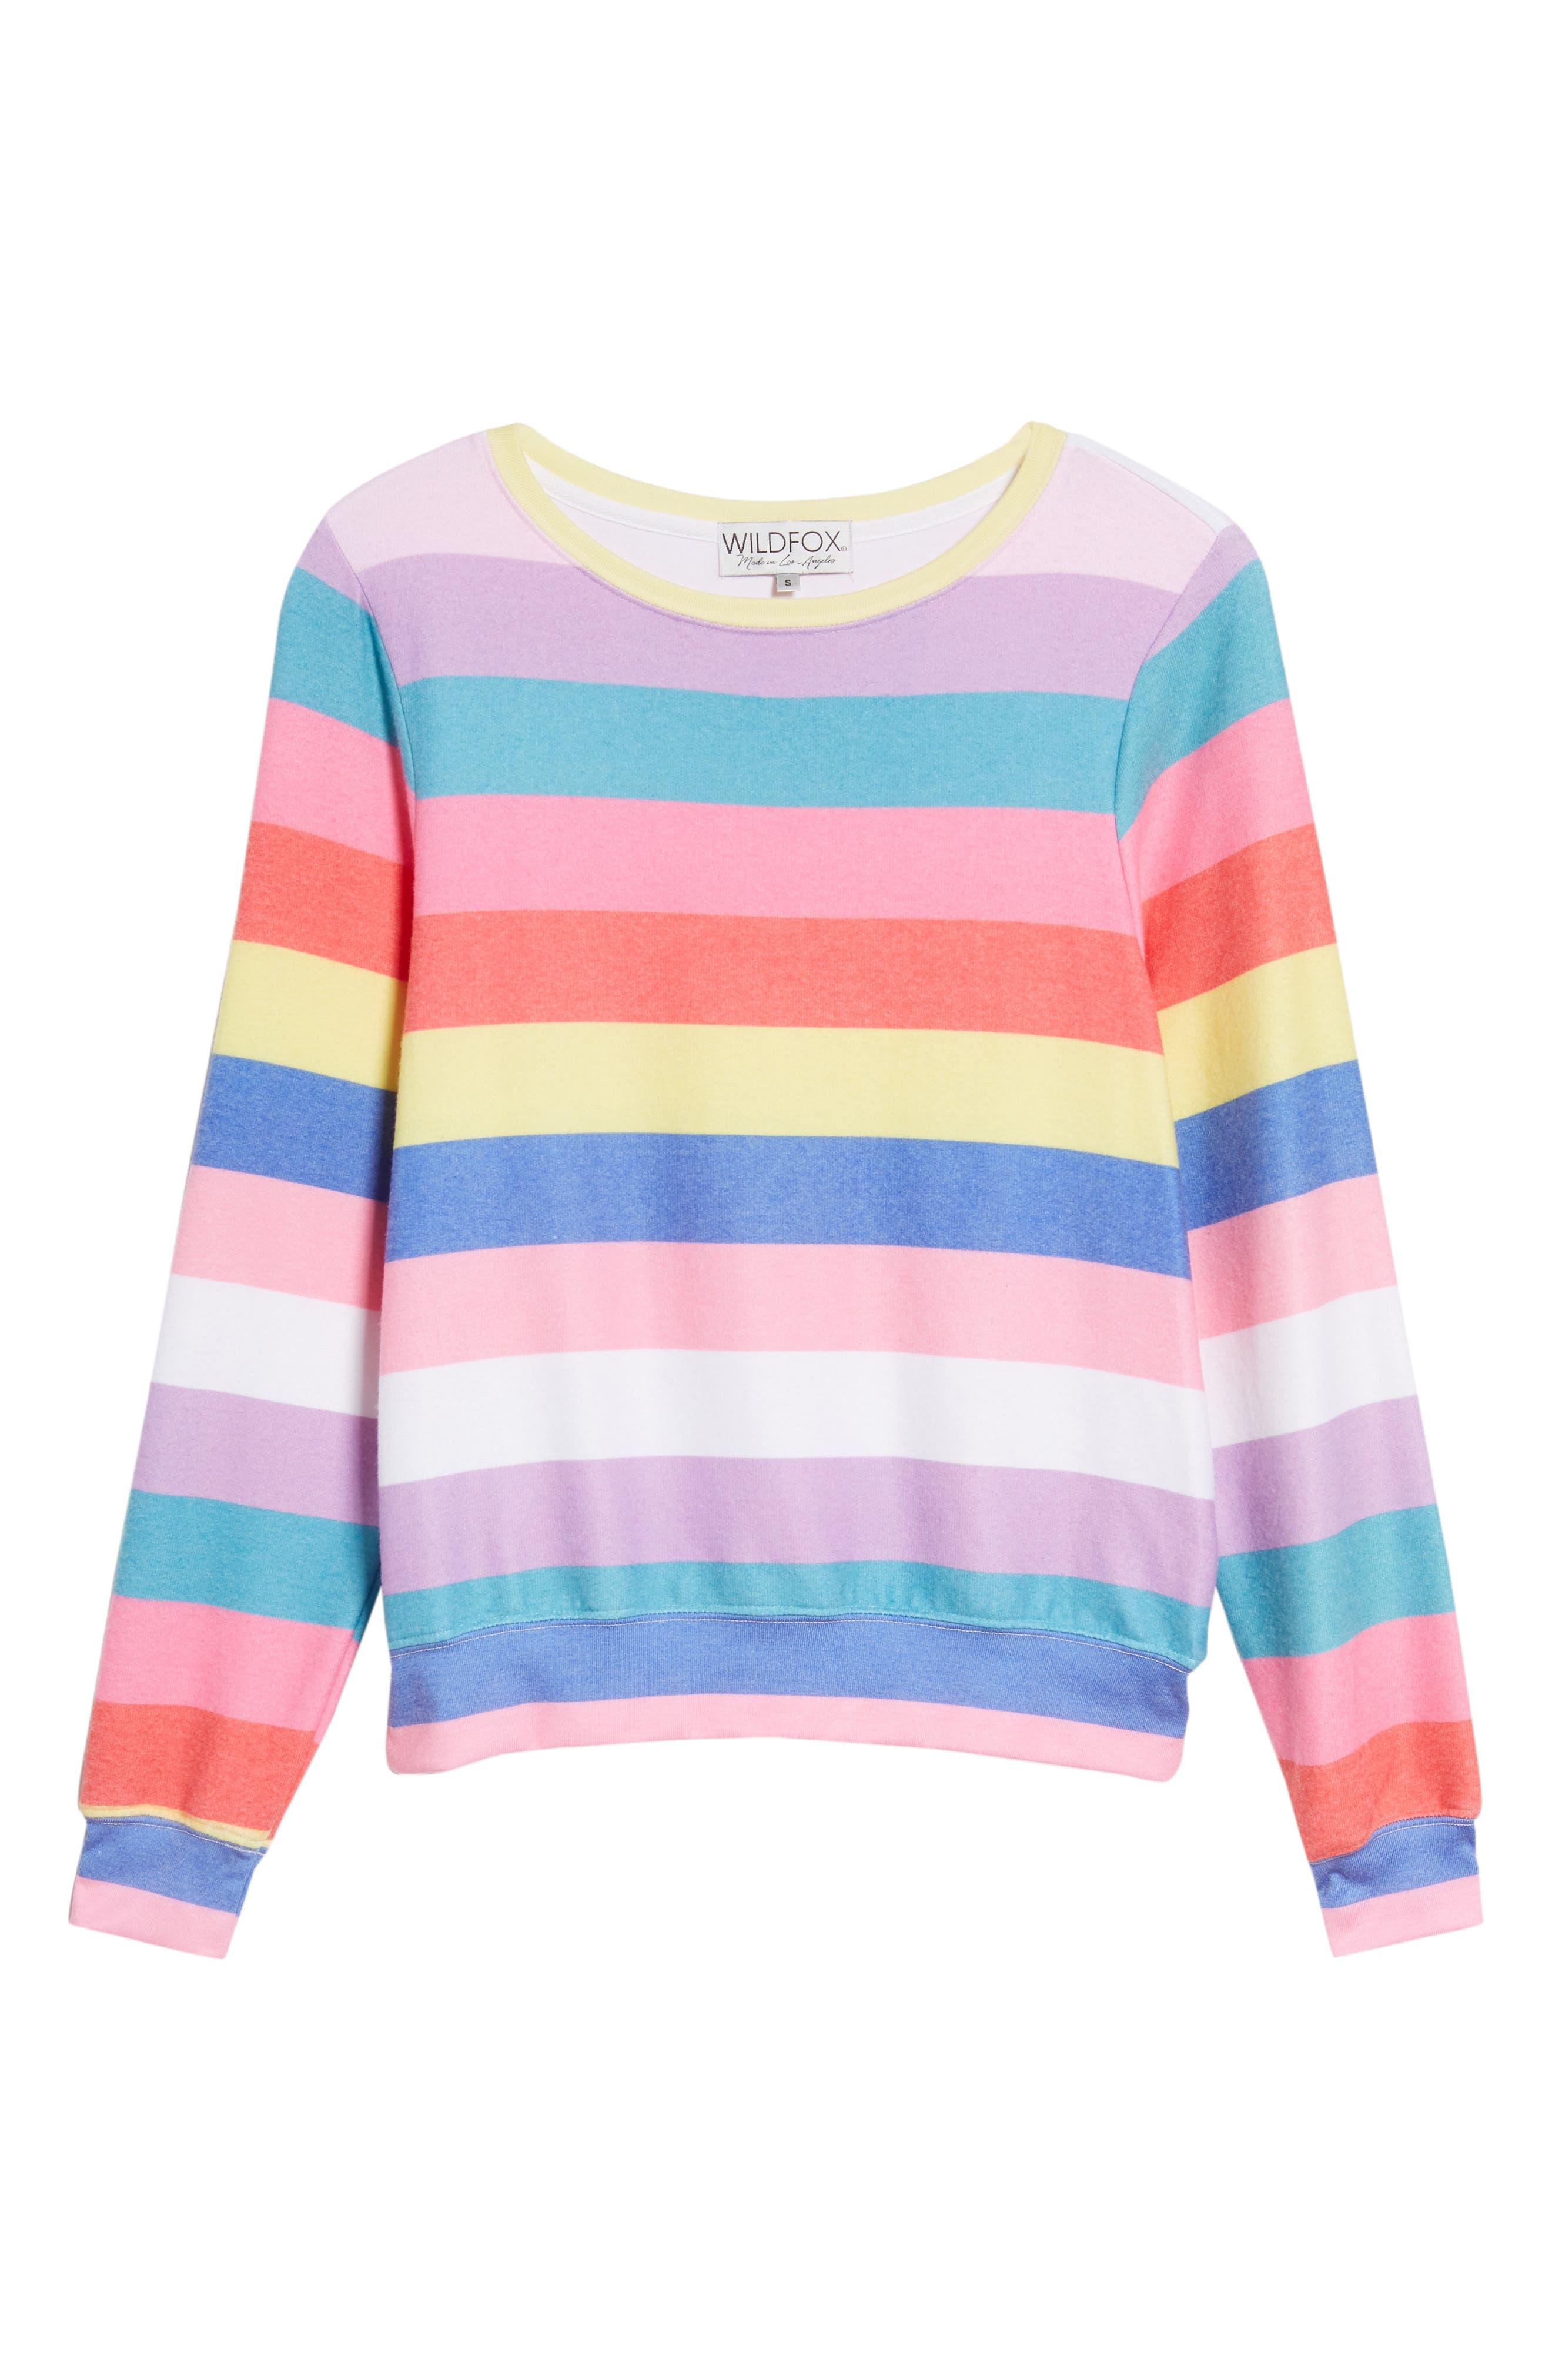 Castaway Roadtrip Sweatshirt,                             Alternate thumbnail 6, color,                             Multi Colored